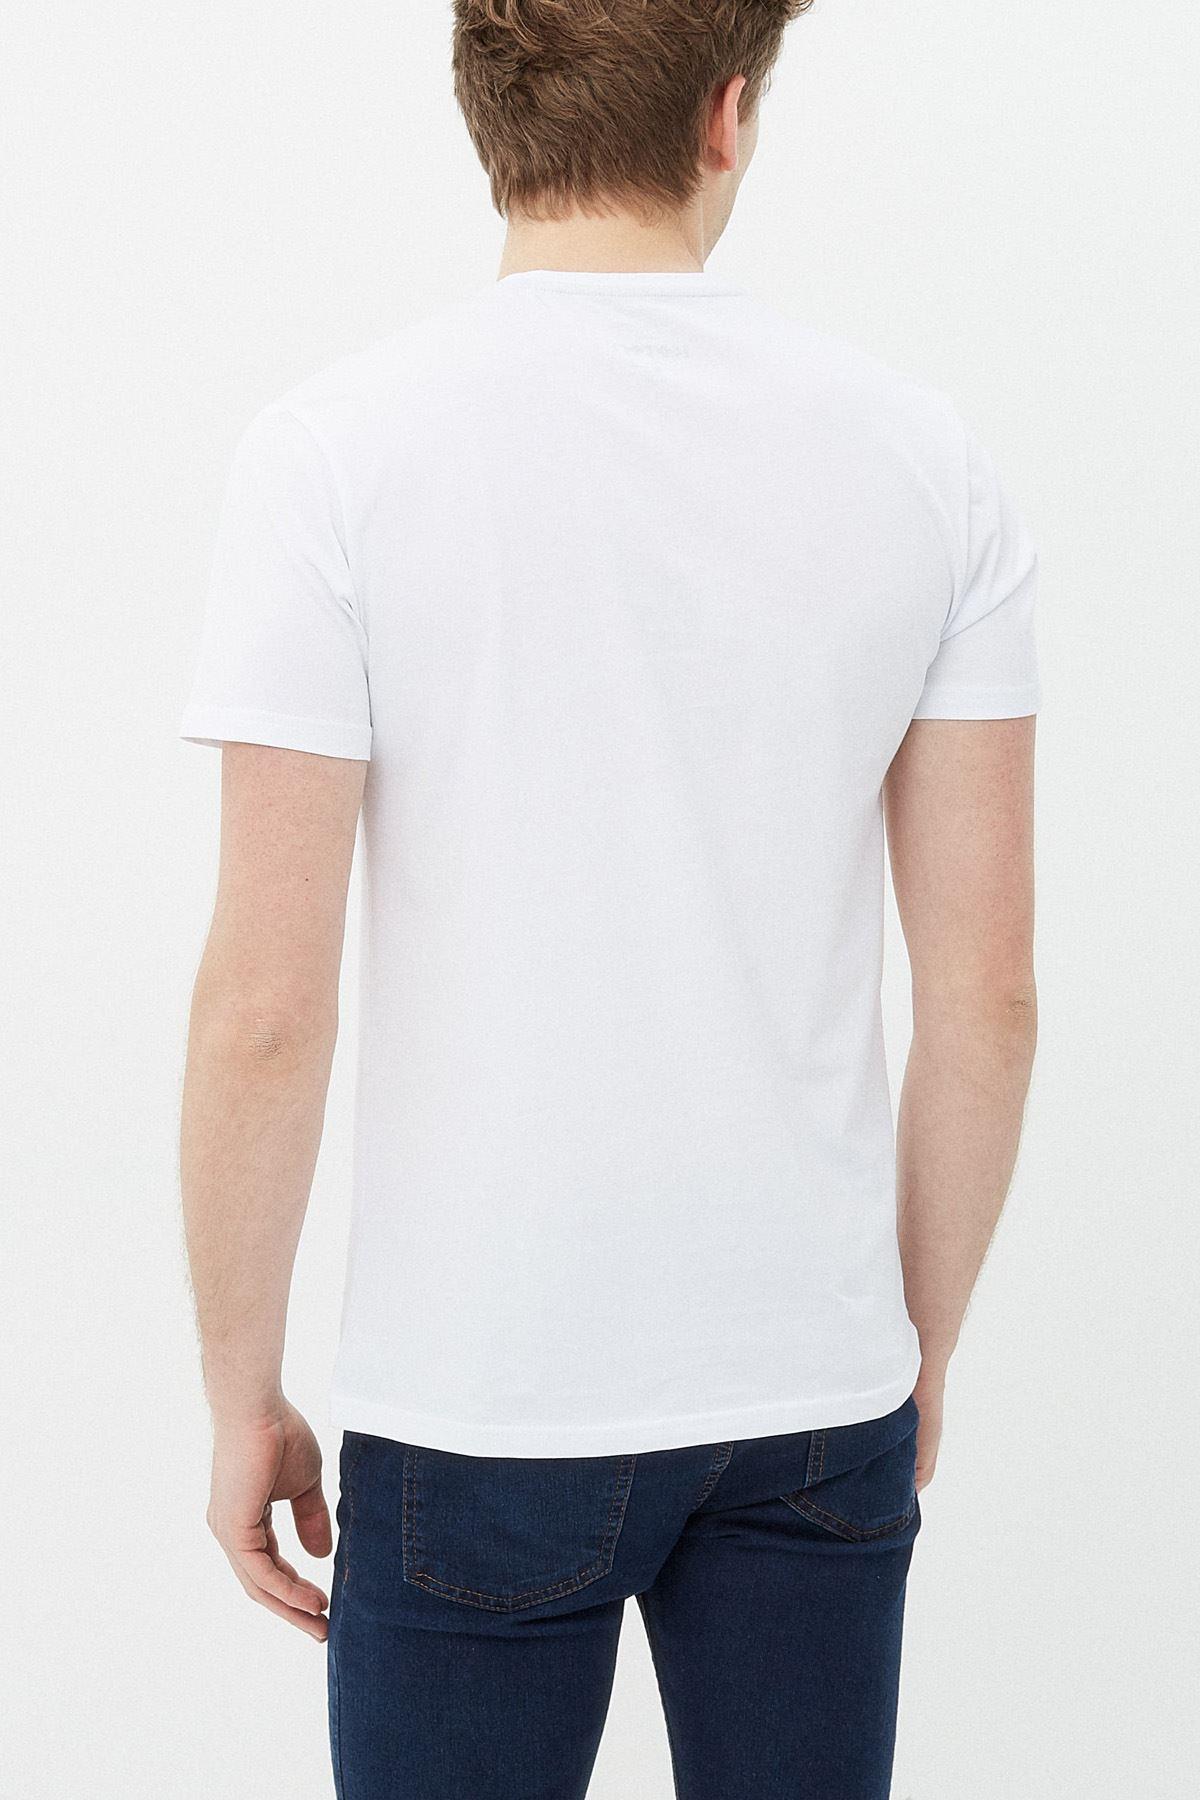 Naruto Anime 07 Beyaz Erkek Tshirt - Tişört